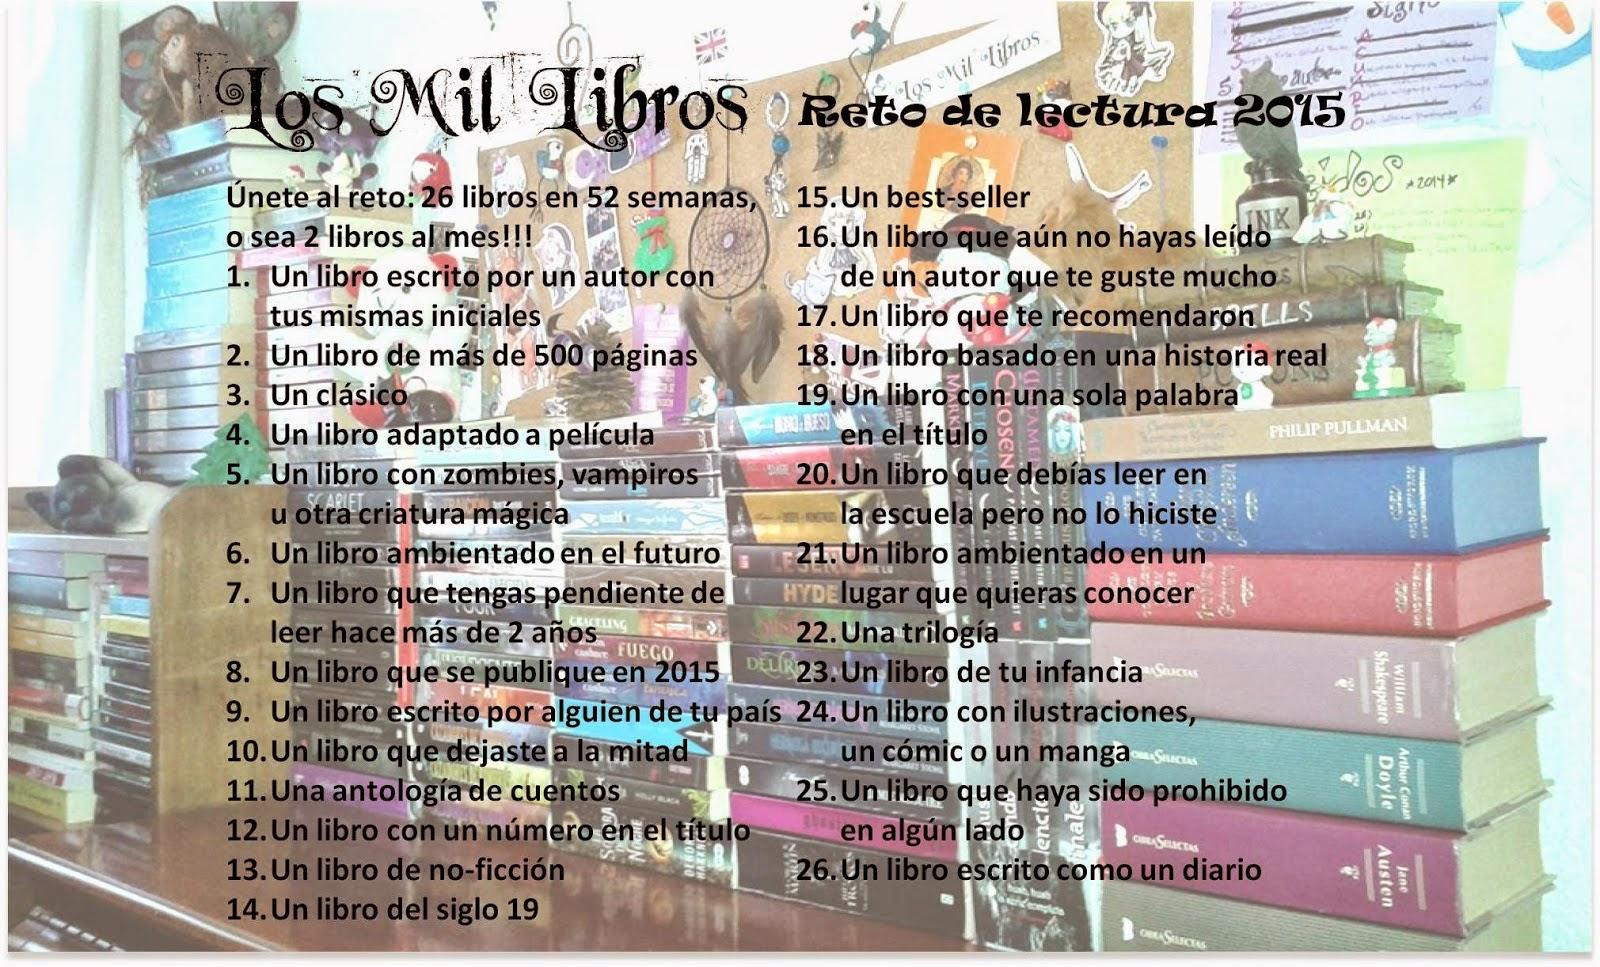 http://losmillibros.blogspot.com.es/2014/12/reto-de-lectura-de-2015.html?showComment=1419333691183#c536754940590833976